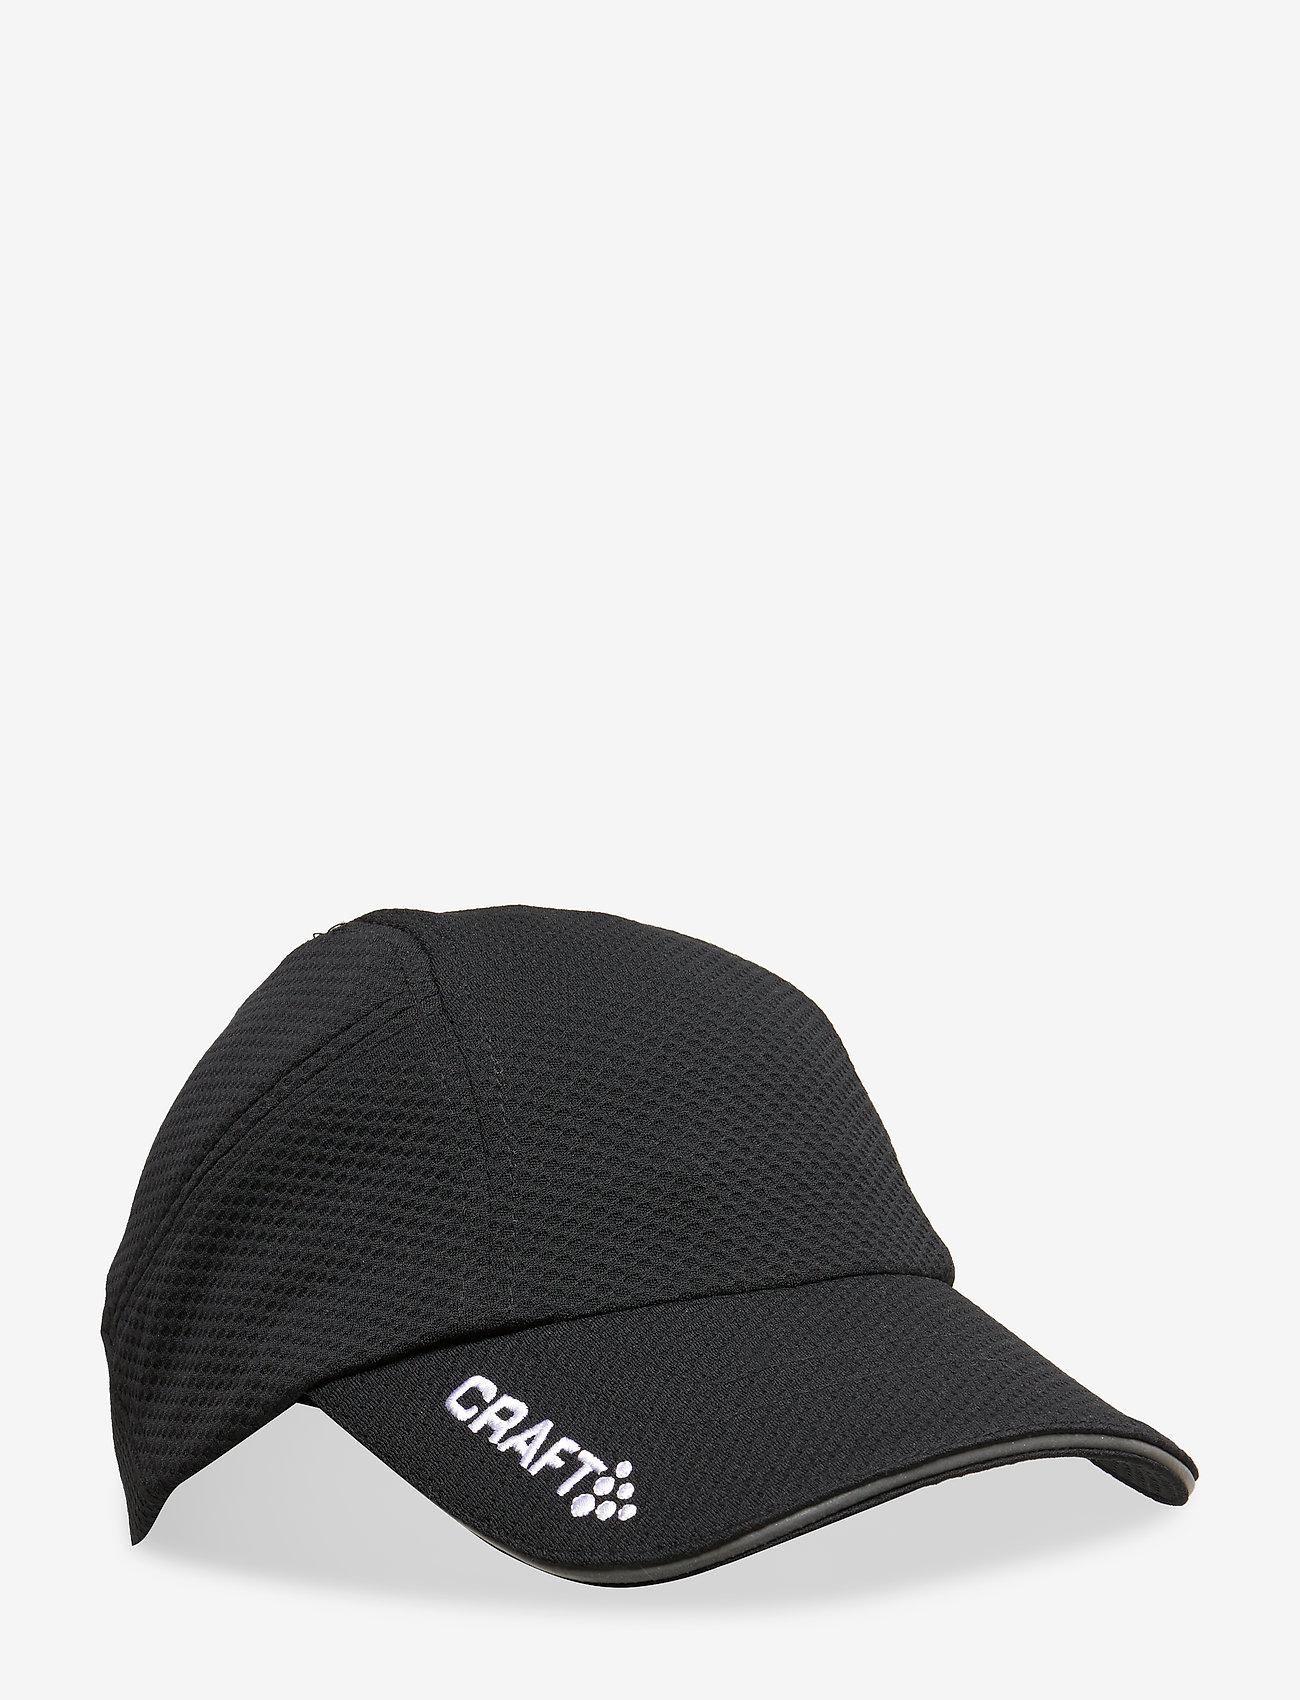 Craft - RUN CAP WHITE ONE SIZE FLUMINO  - accessories - black - 0